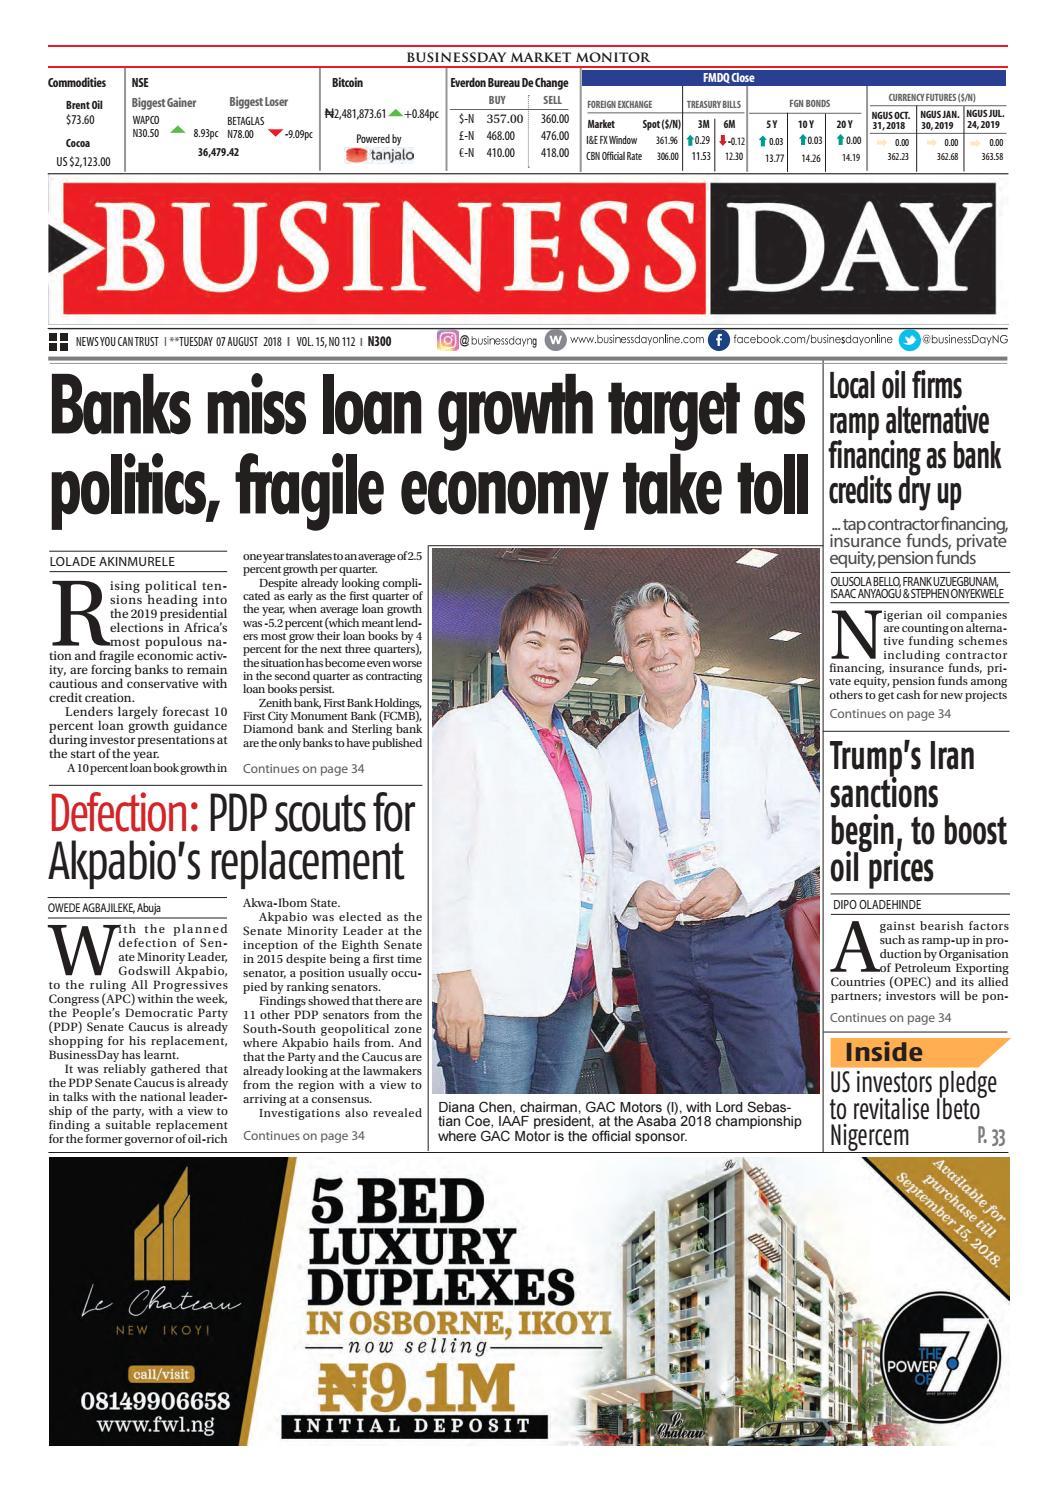 BusinessDay 07 Aug 2018 by BusinessDay - issuu